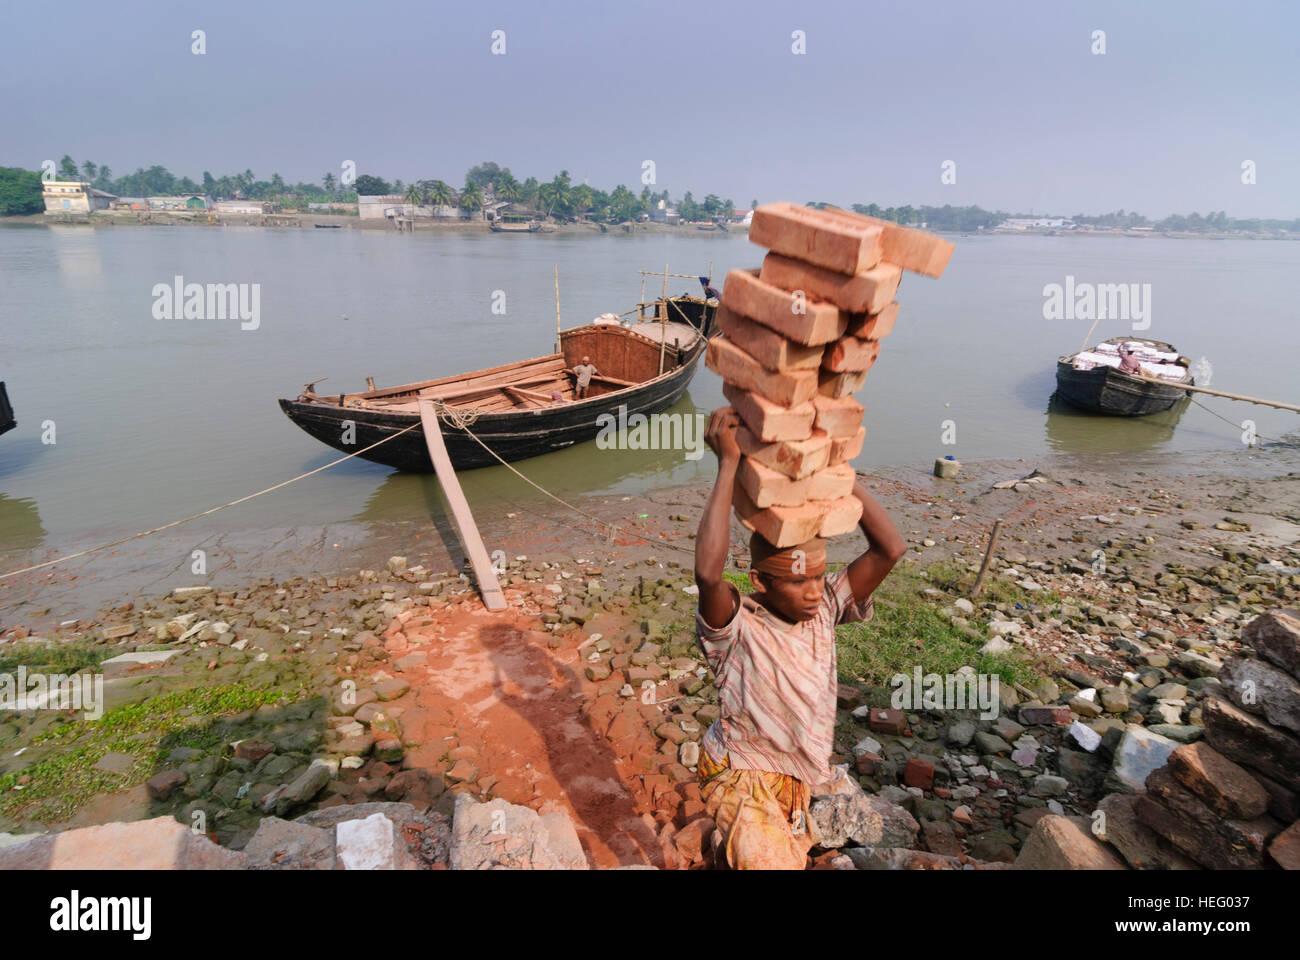 Khulna: porto di Fiume Bhairab, barca, uomini, carichi di bearer, Khulna Division, Bangladesh Immagini Stock